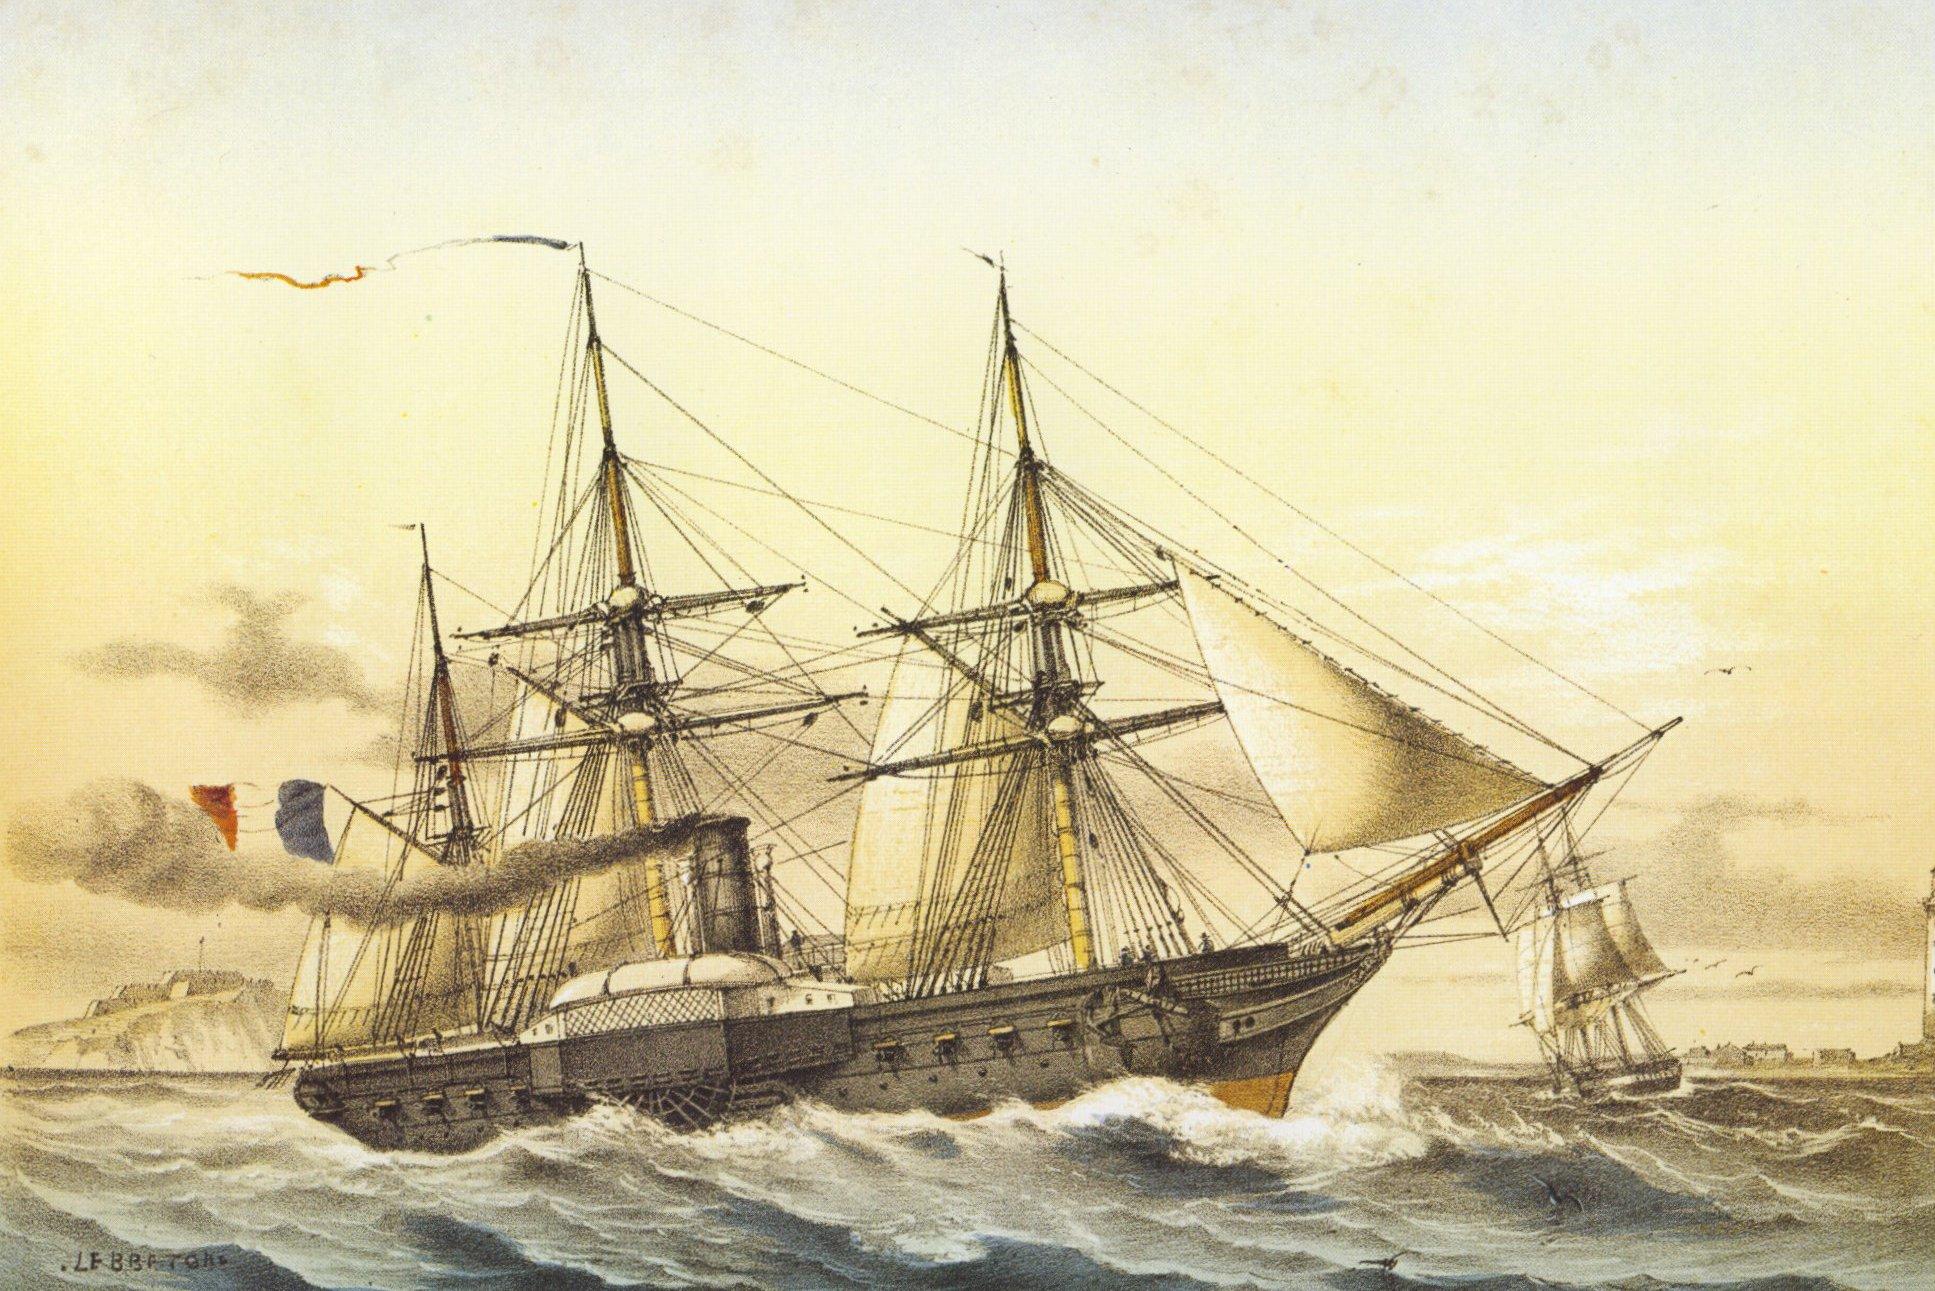 19th Century British Sailing Ships